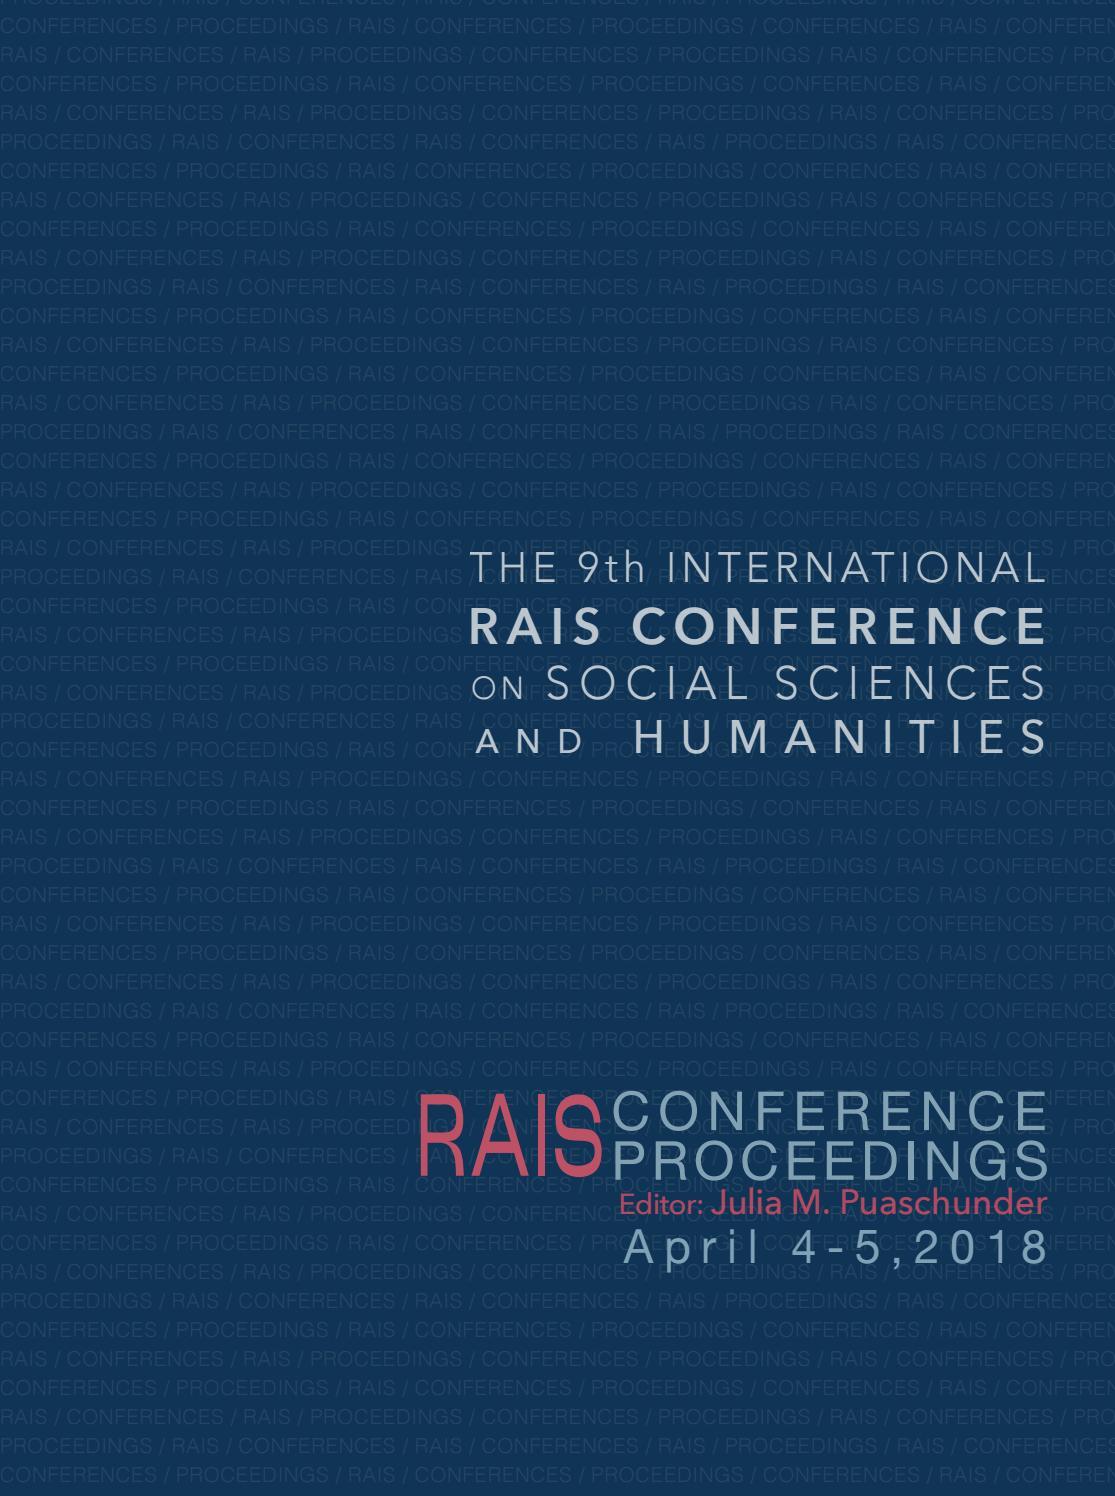 RAIS Conference Proceedings - The 9th International International